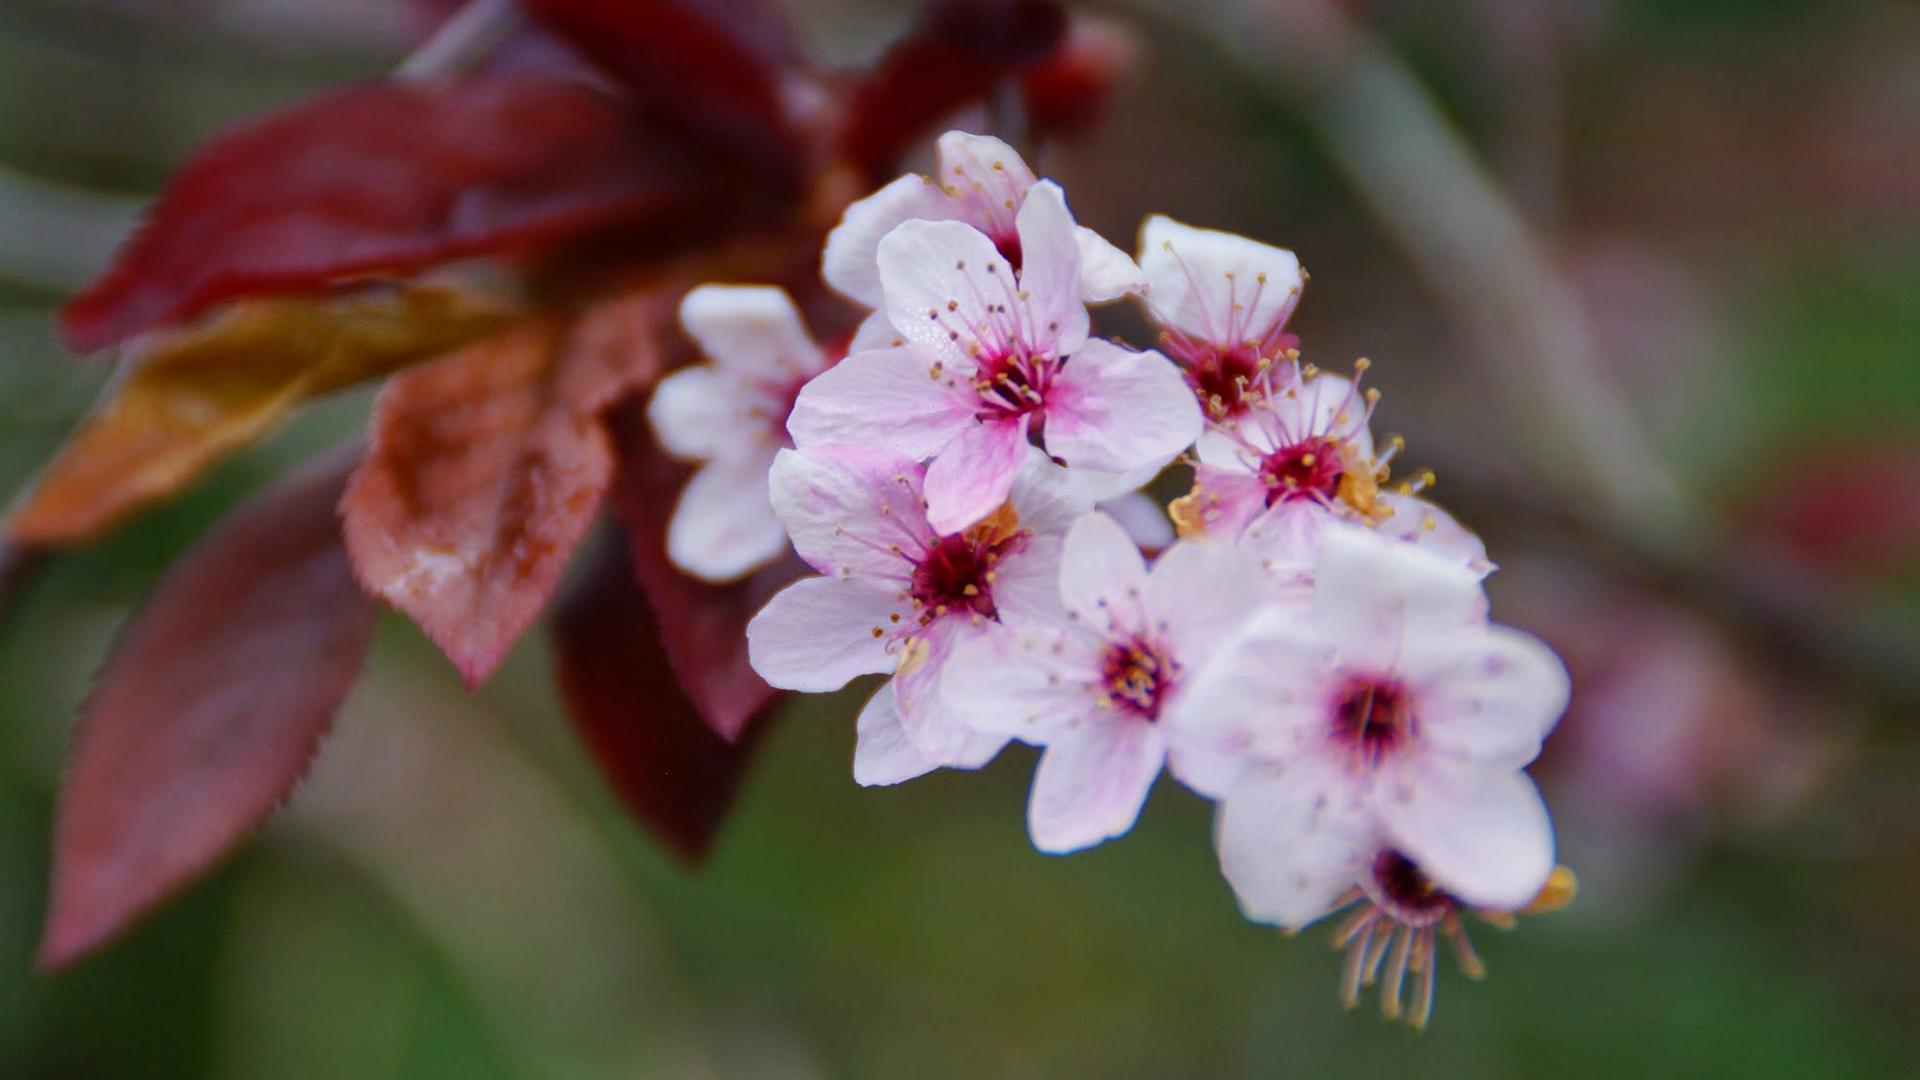 Falling Cherry Blossoms Wallpaper Cherry Blossom Hd Wallpaper Hd Wallpapers Wallpapers